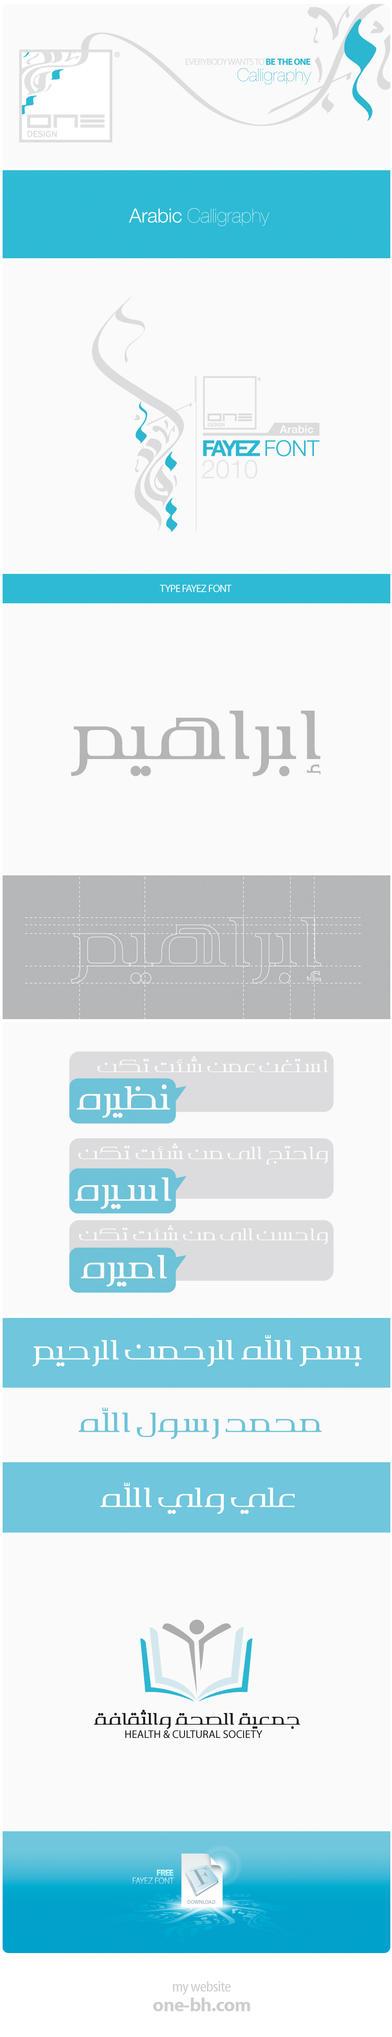 Arabic Typo Font (Fayez) by one-bh